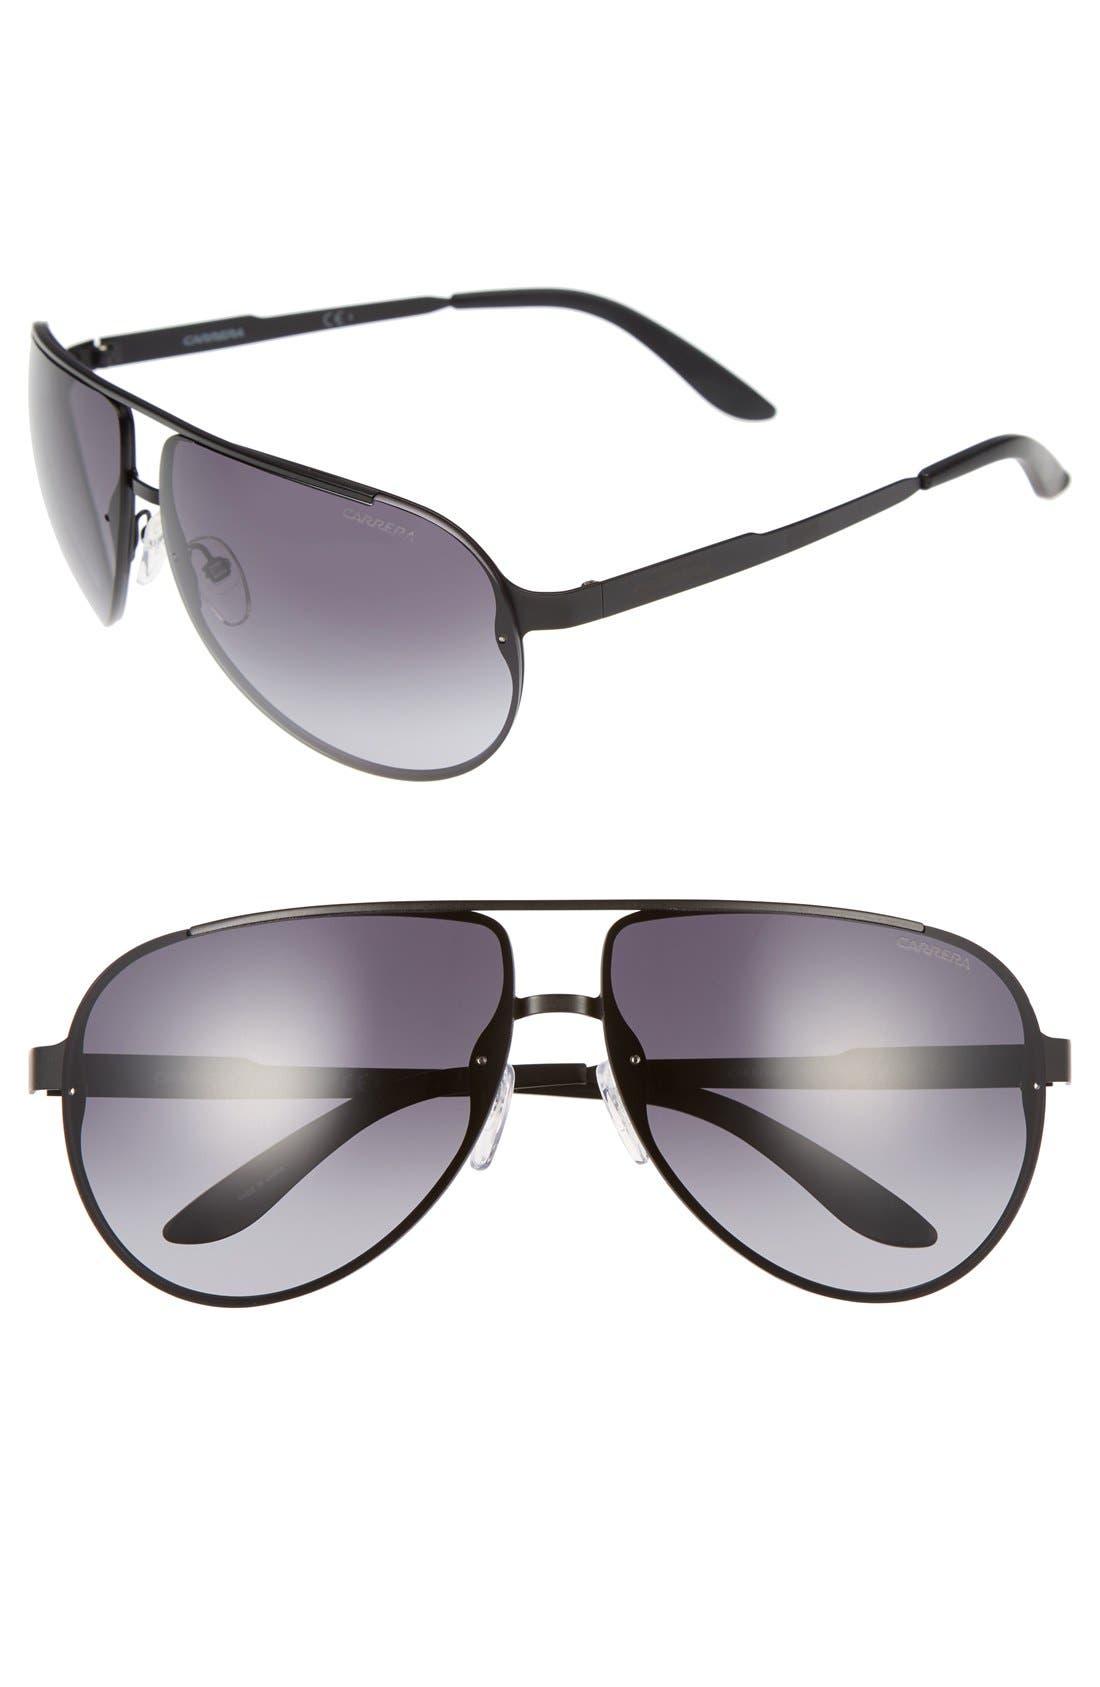 CA102 65mm Aviator Sunglasses,                         Main,                         color, 001